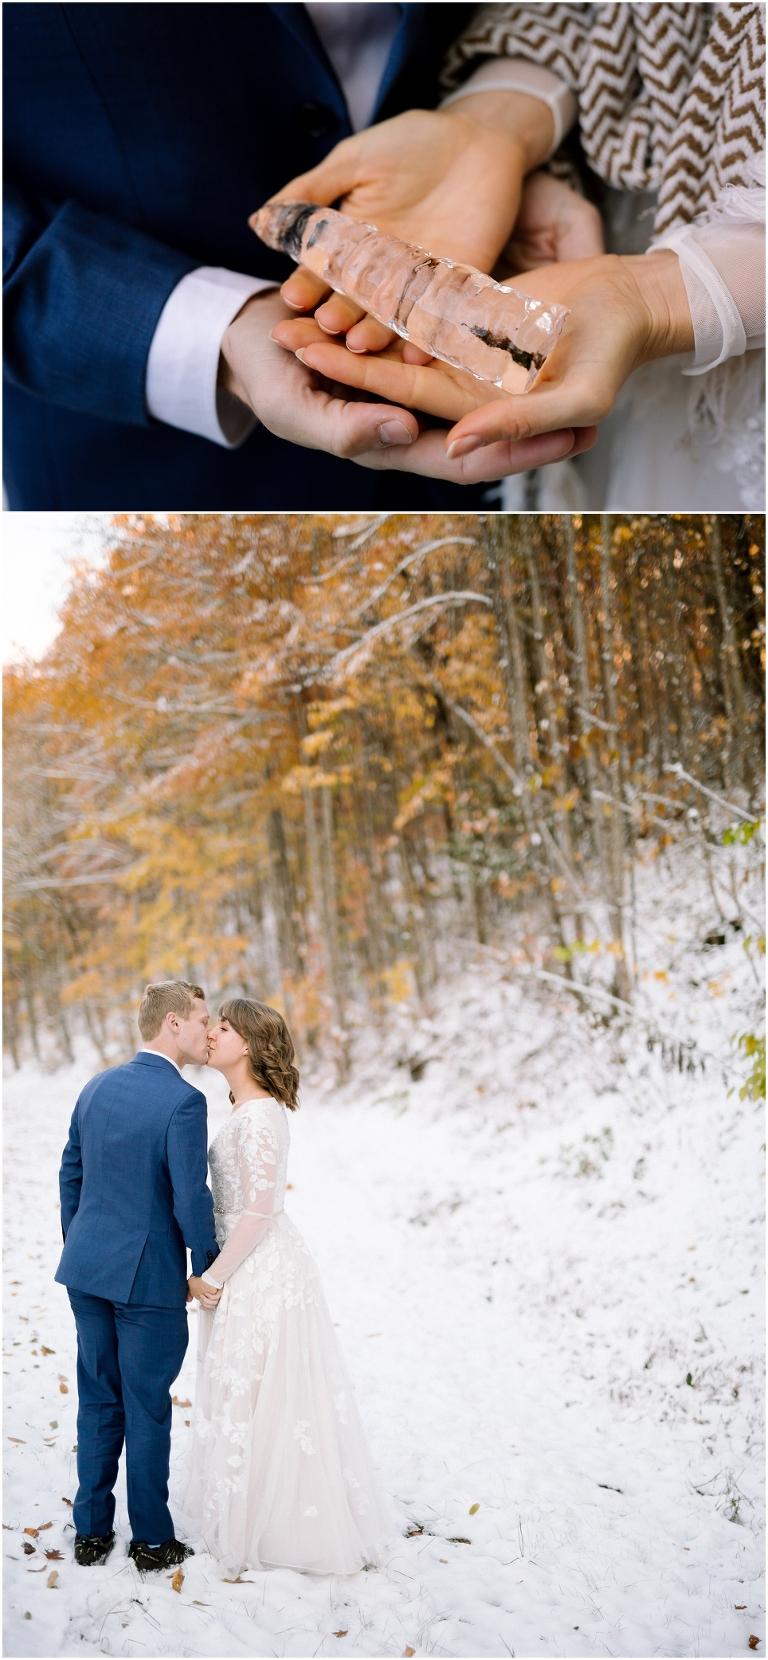 Snow Wedding in the Smoky Mountains